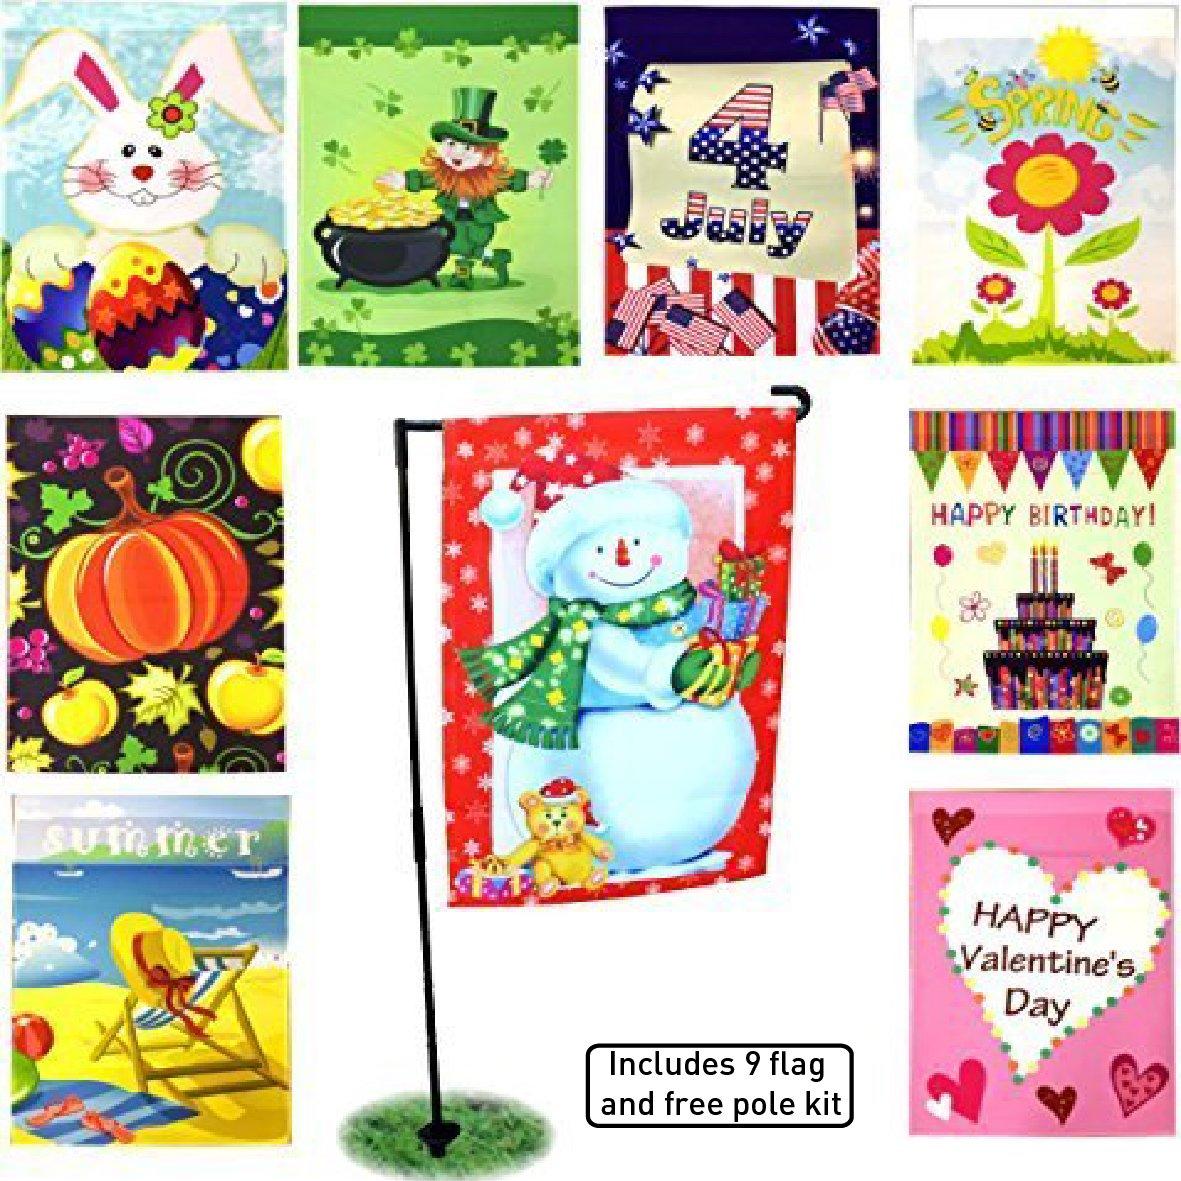 EasyGoProducts EGP-GARD-010 FBA_EGP-GARD-010 Seasonal Holiday Garden Flag Set – Christmas, Easter, Birthday etc…